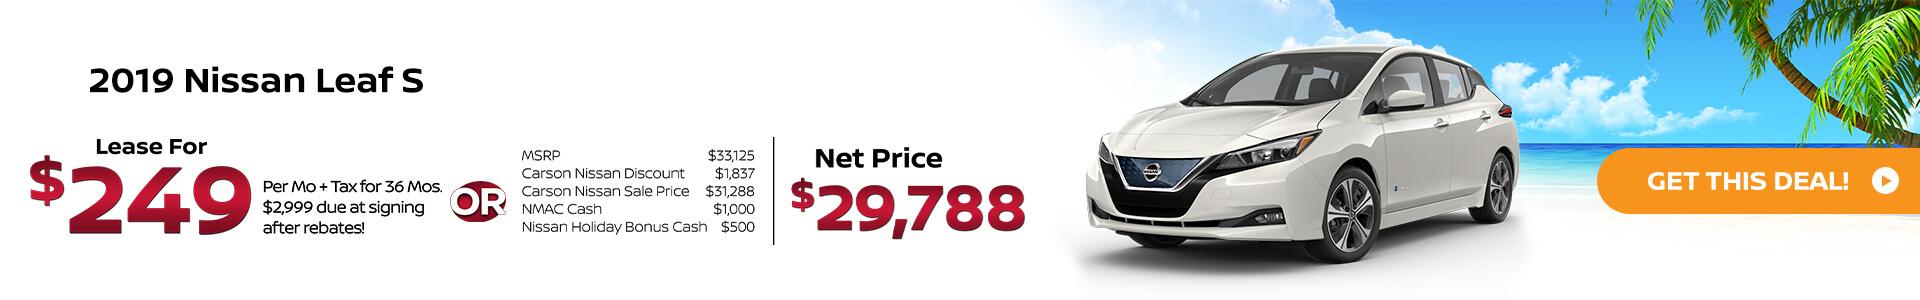 All New 2019 Nissan Leaf Plus Carson Nissan